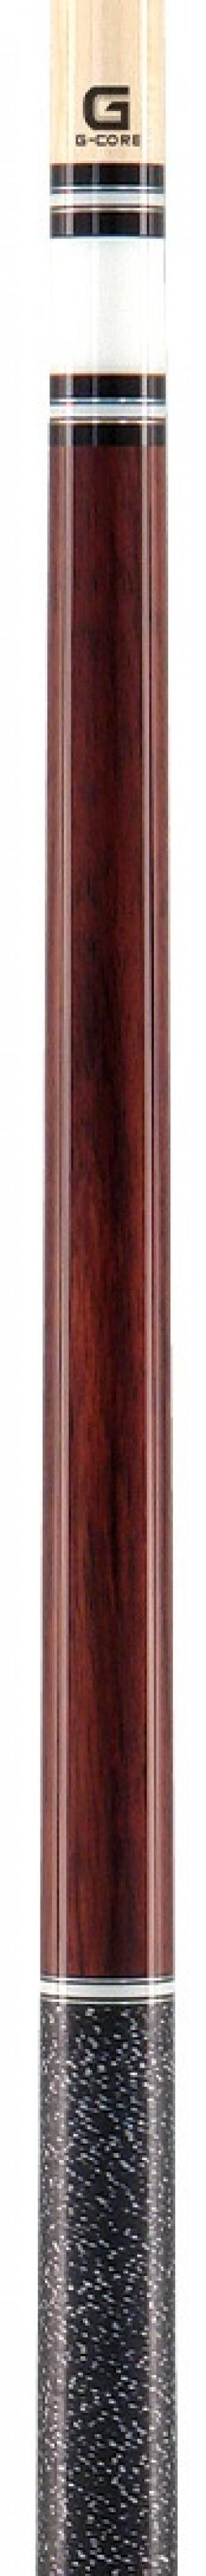 McDermott G-Series Cue G222